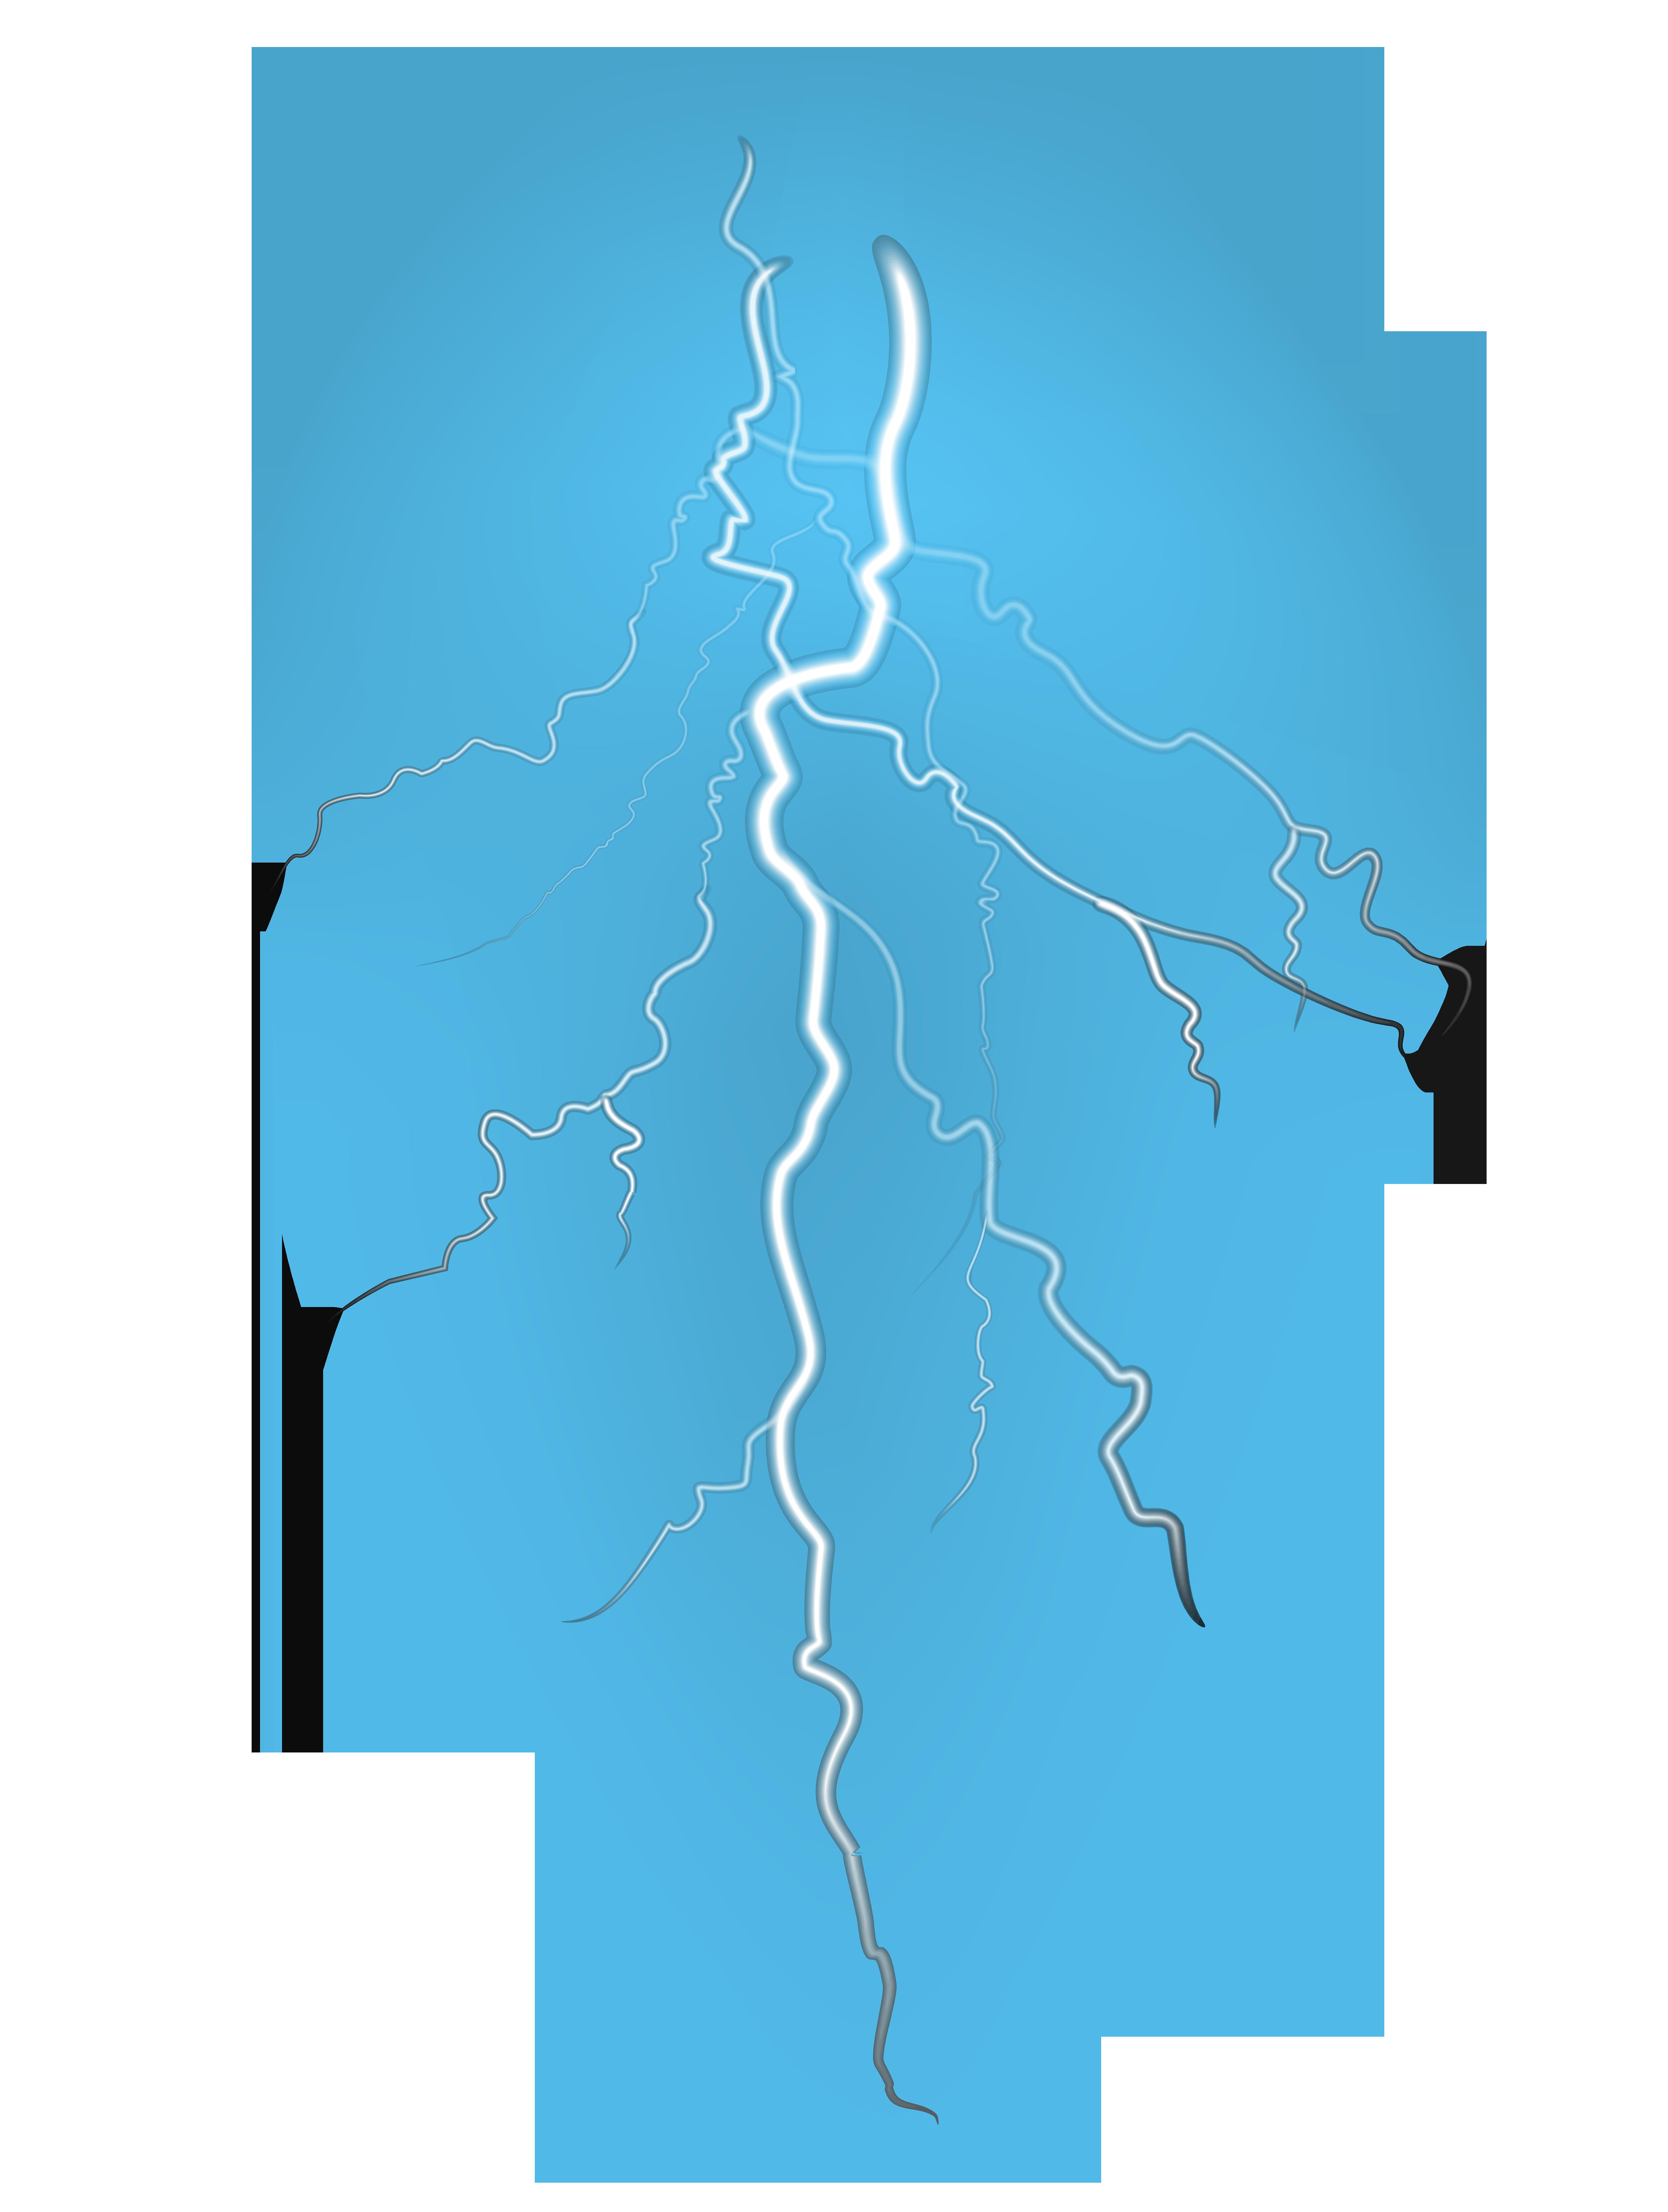 Free Lightning Transparent Png, Download Free Clip Art, Free.